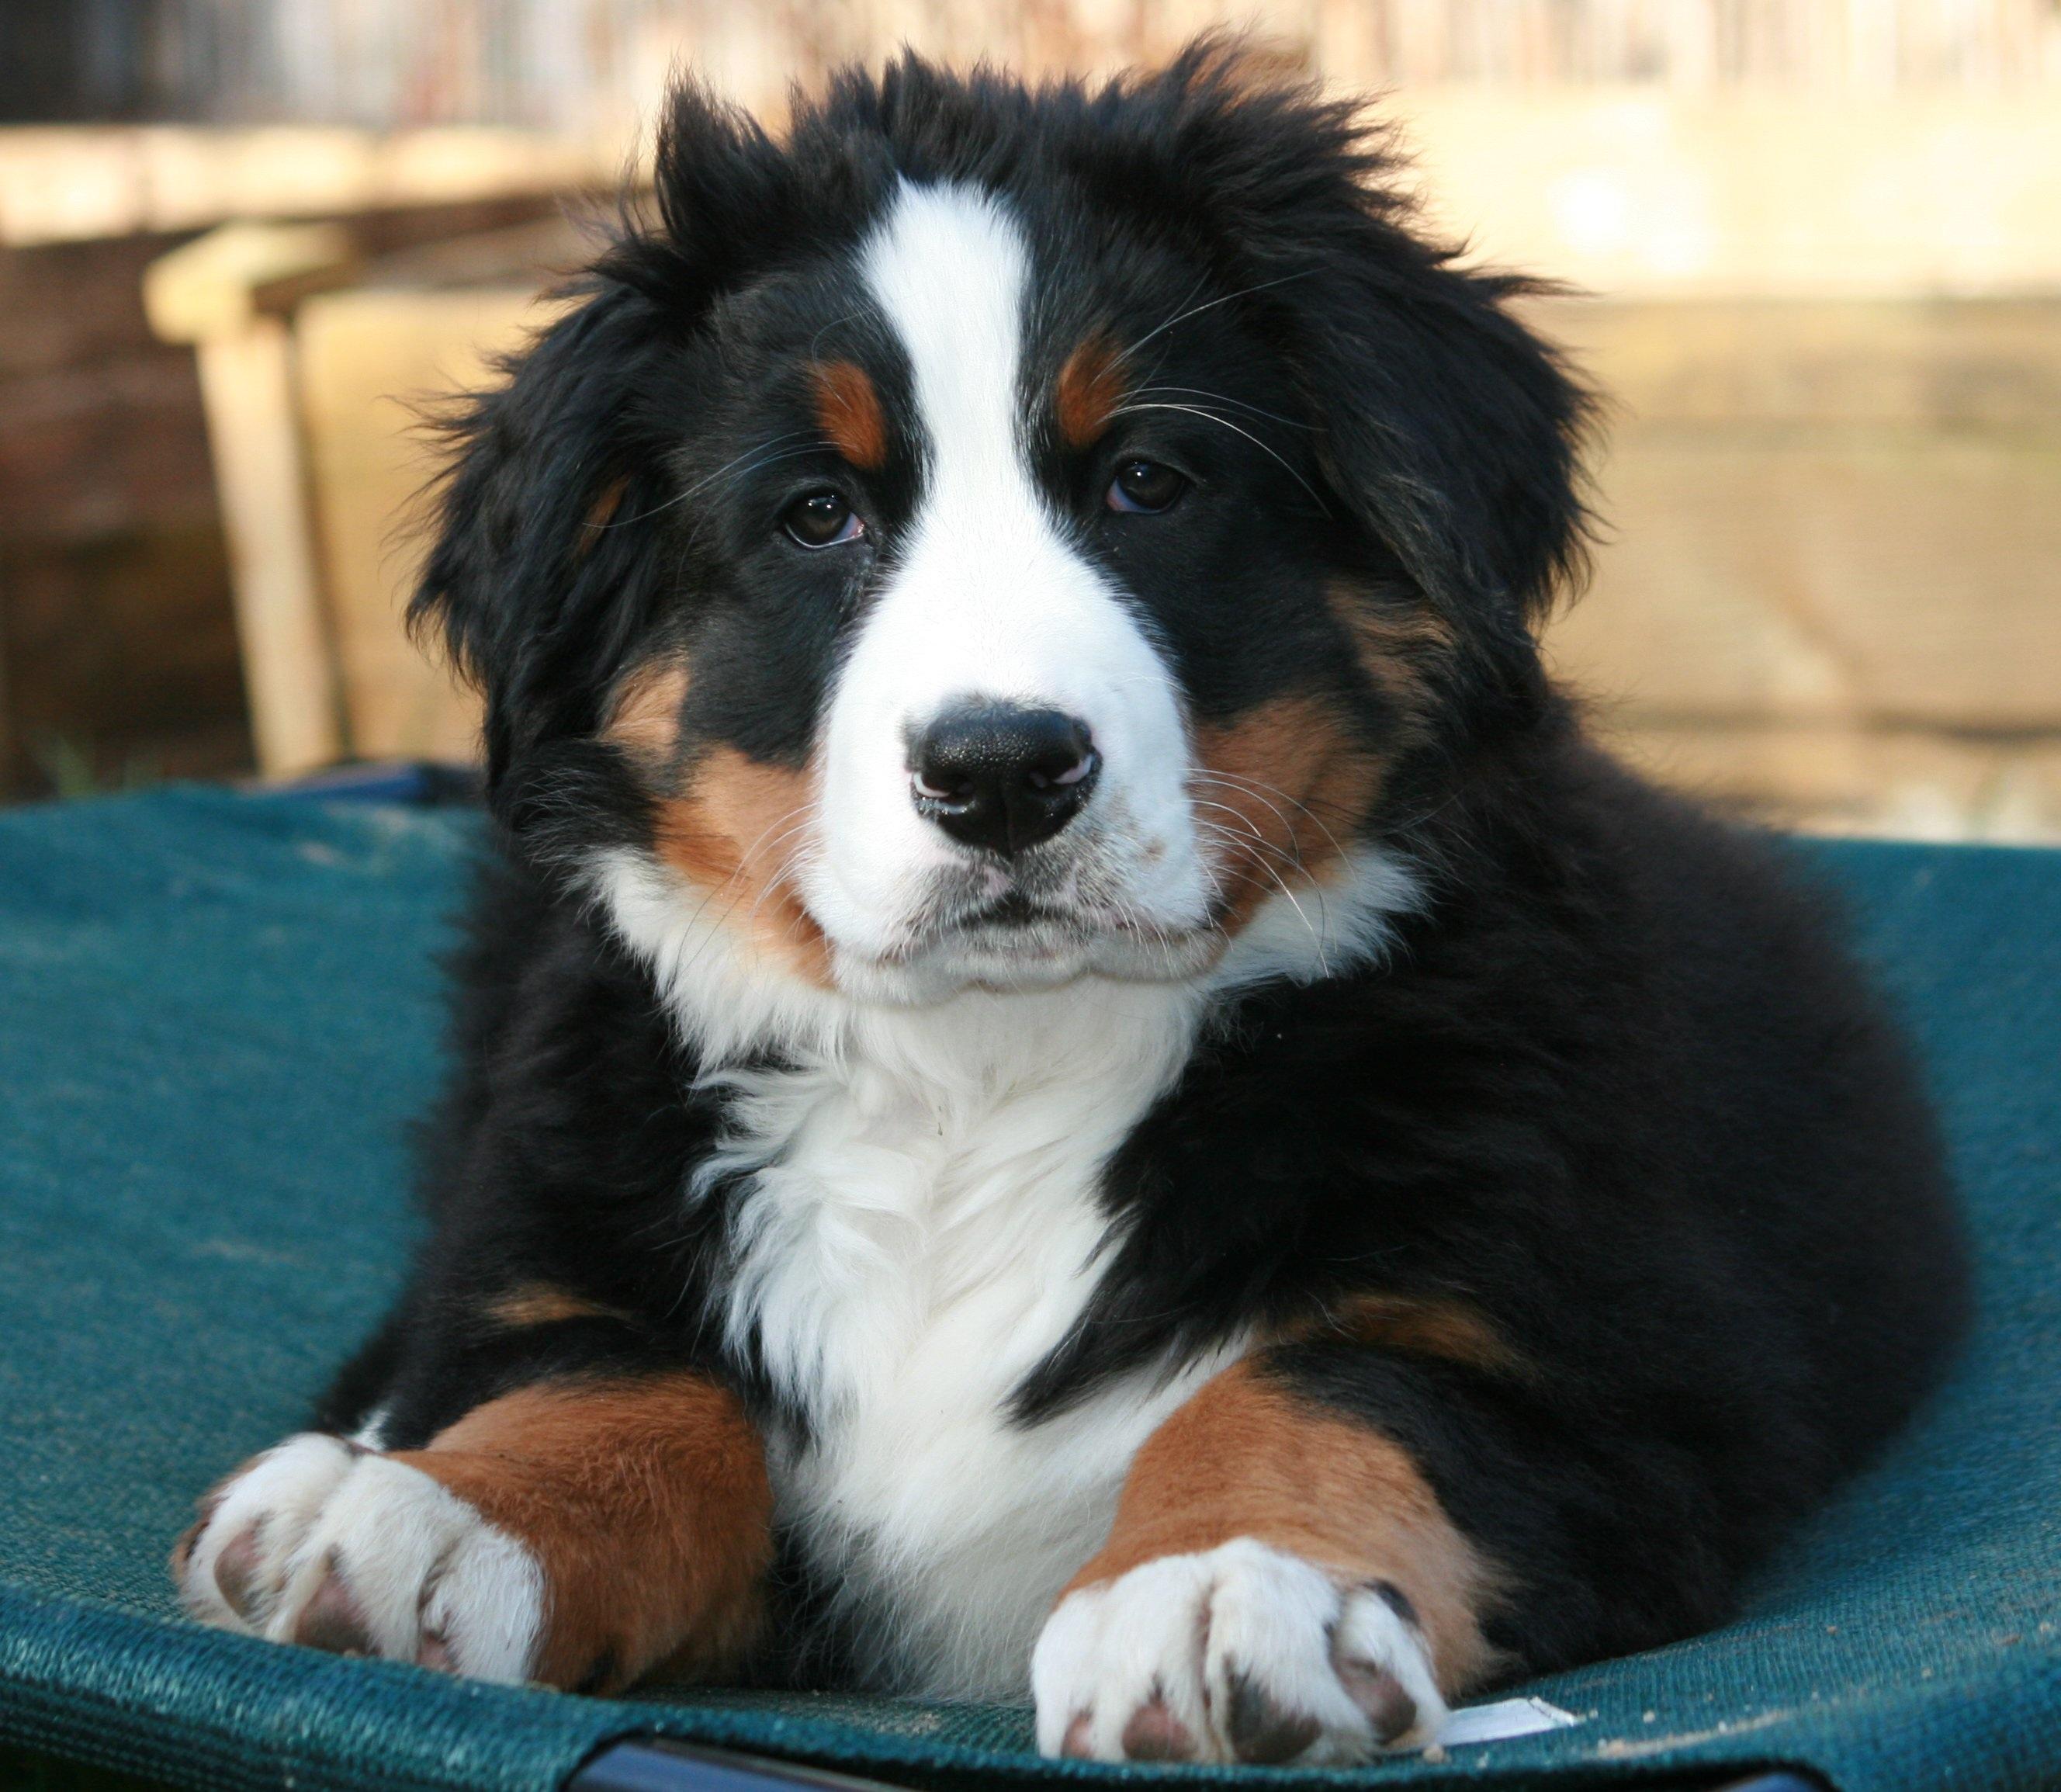 Free Images Puppy Close Vertebrate Dog Breed